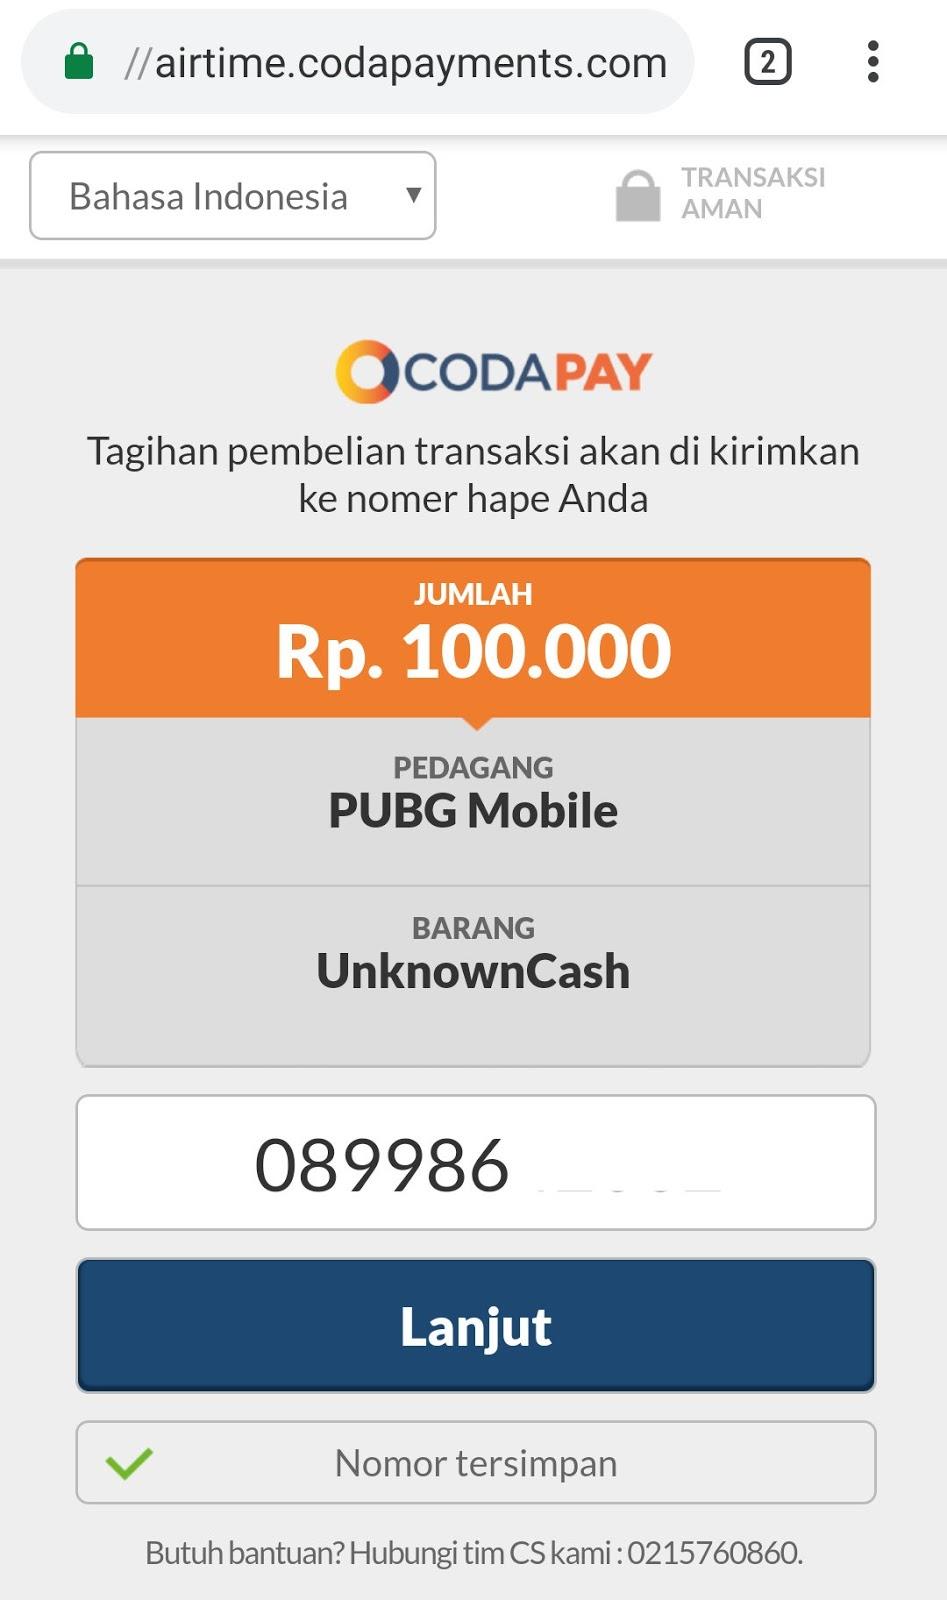 Cara Beli Cash UC PUBG Mobile Pakai Pulsa Dijamin 100% AMAN - Ilusi id